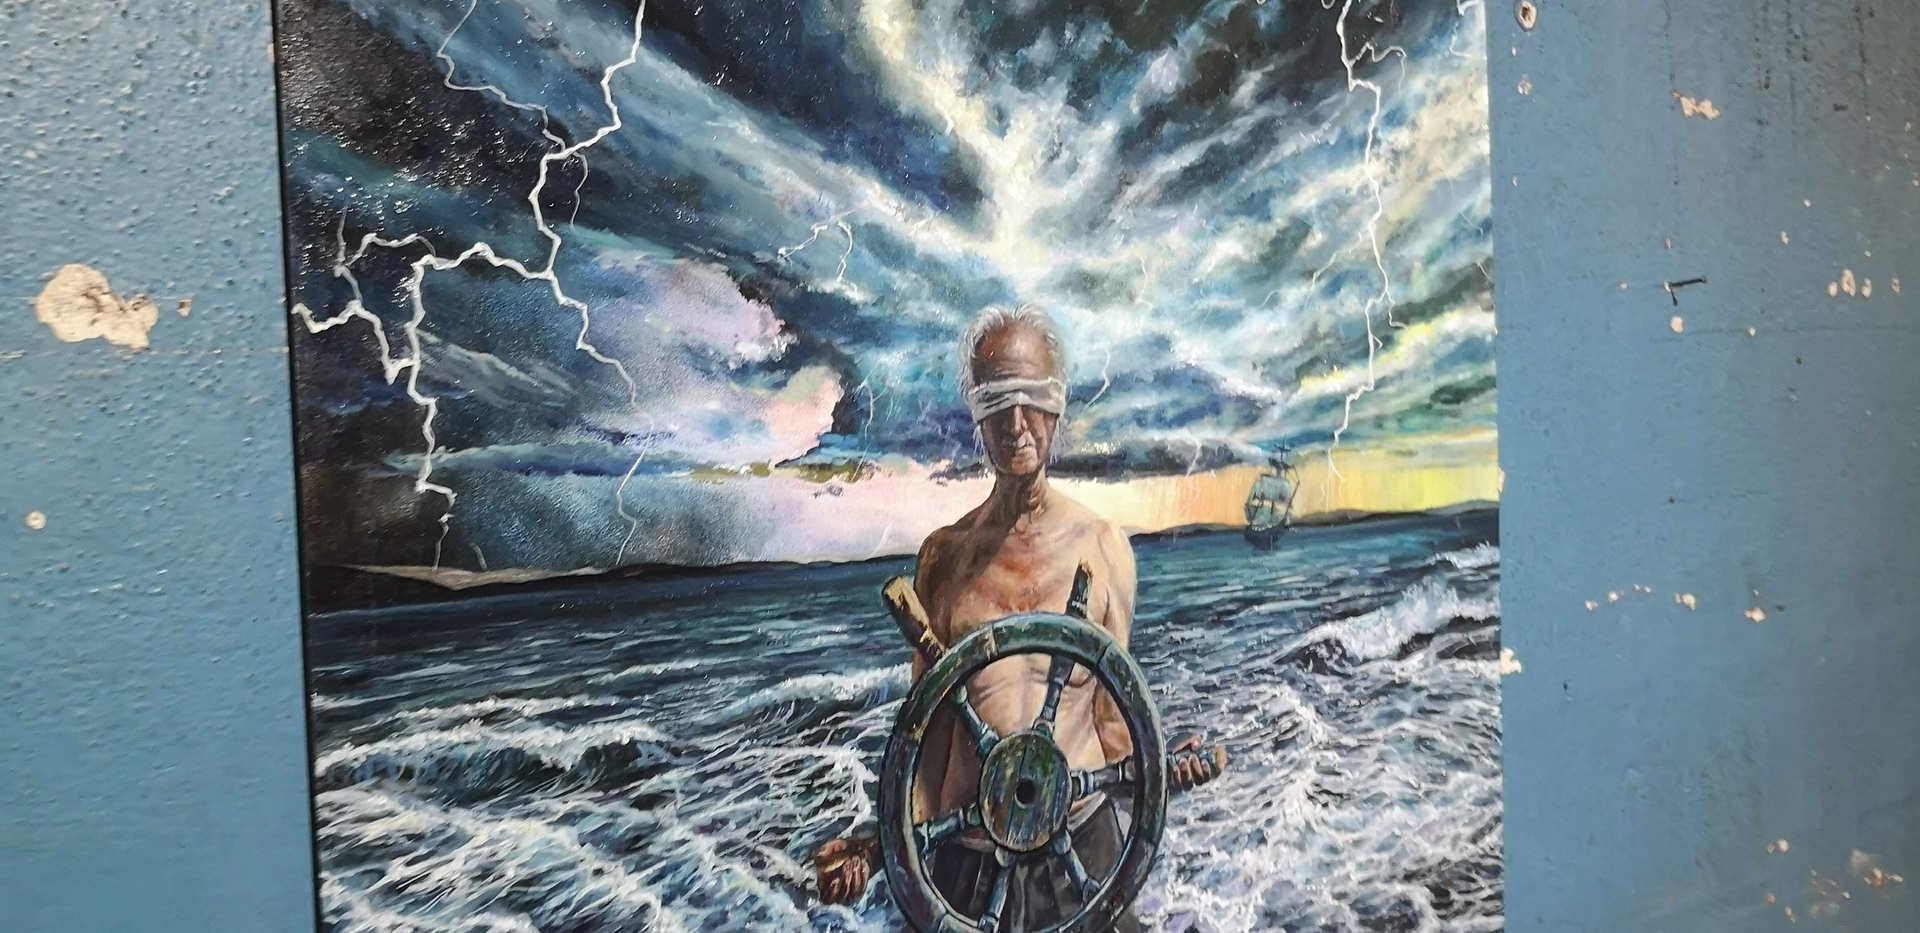 The Captain nagivates